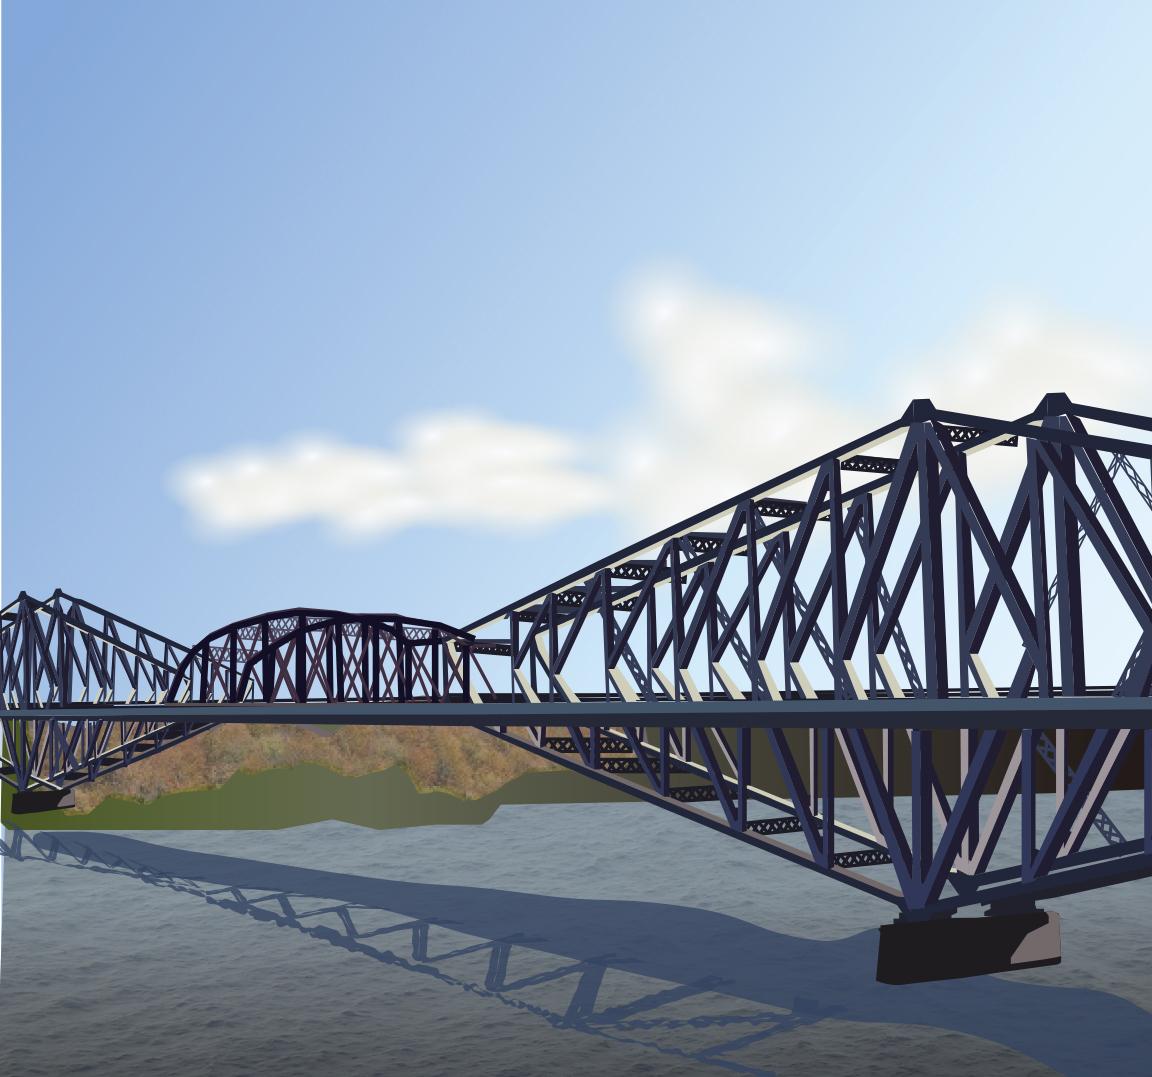 Make A Warren Truss Bridge With Popsicle Sticks Make